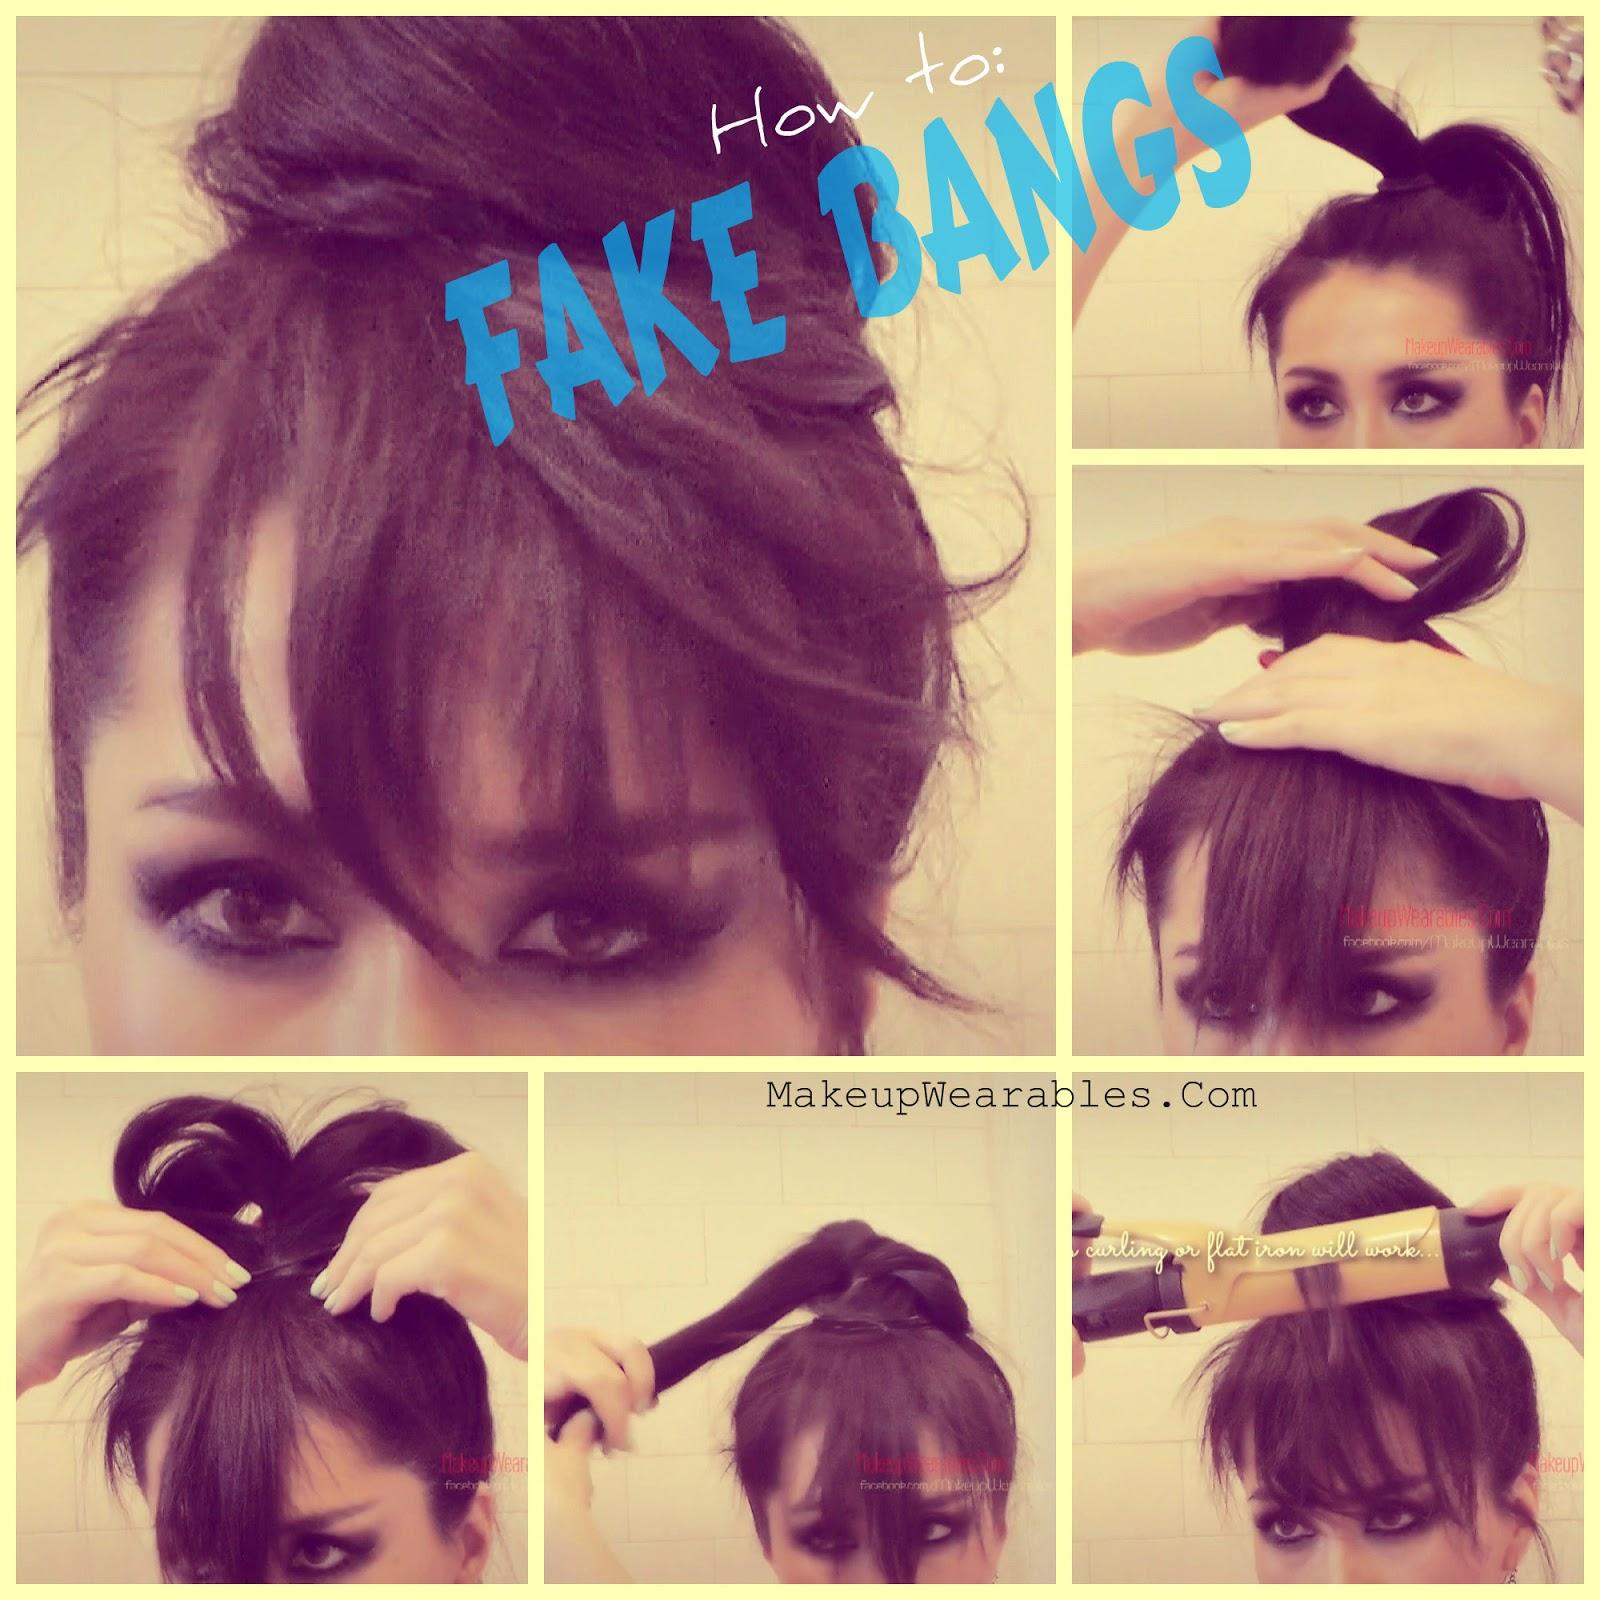 Fabulous How To Fake Bangs Cute Easy Bun Hairstyles Hair Tutorial Video Short Hairstyles Gunalazisus